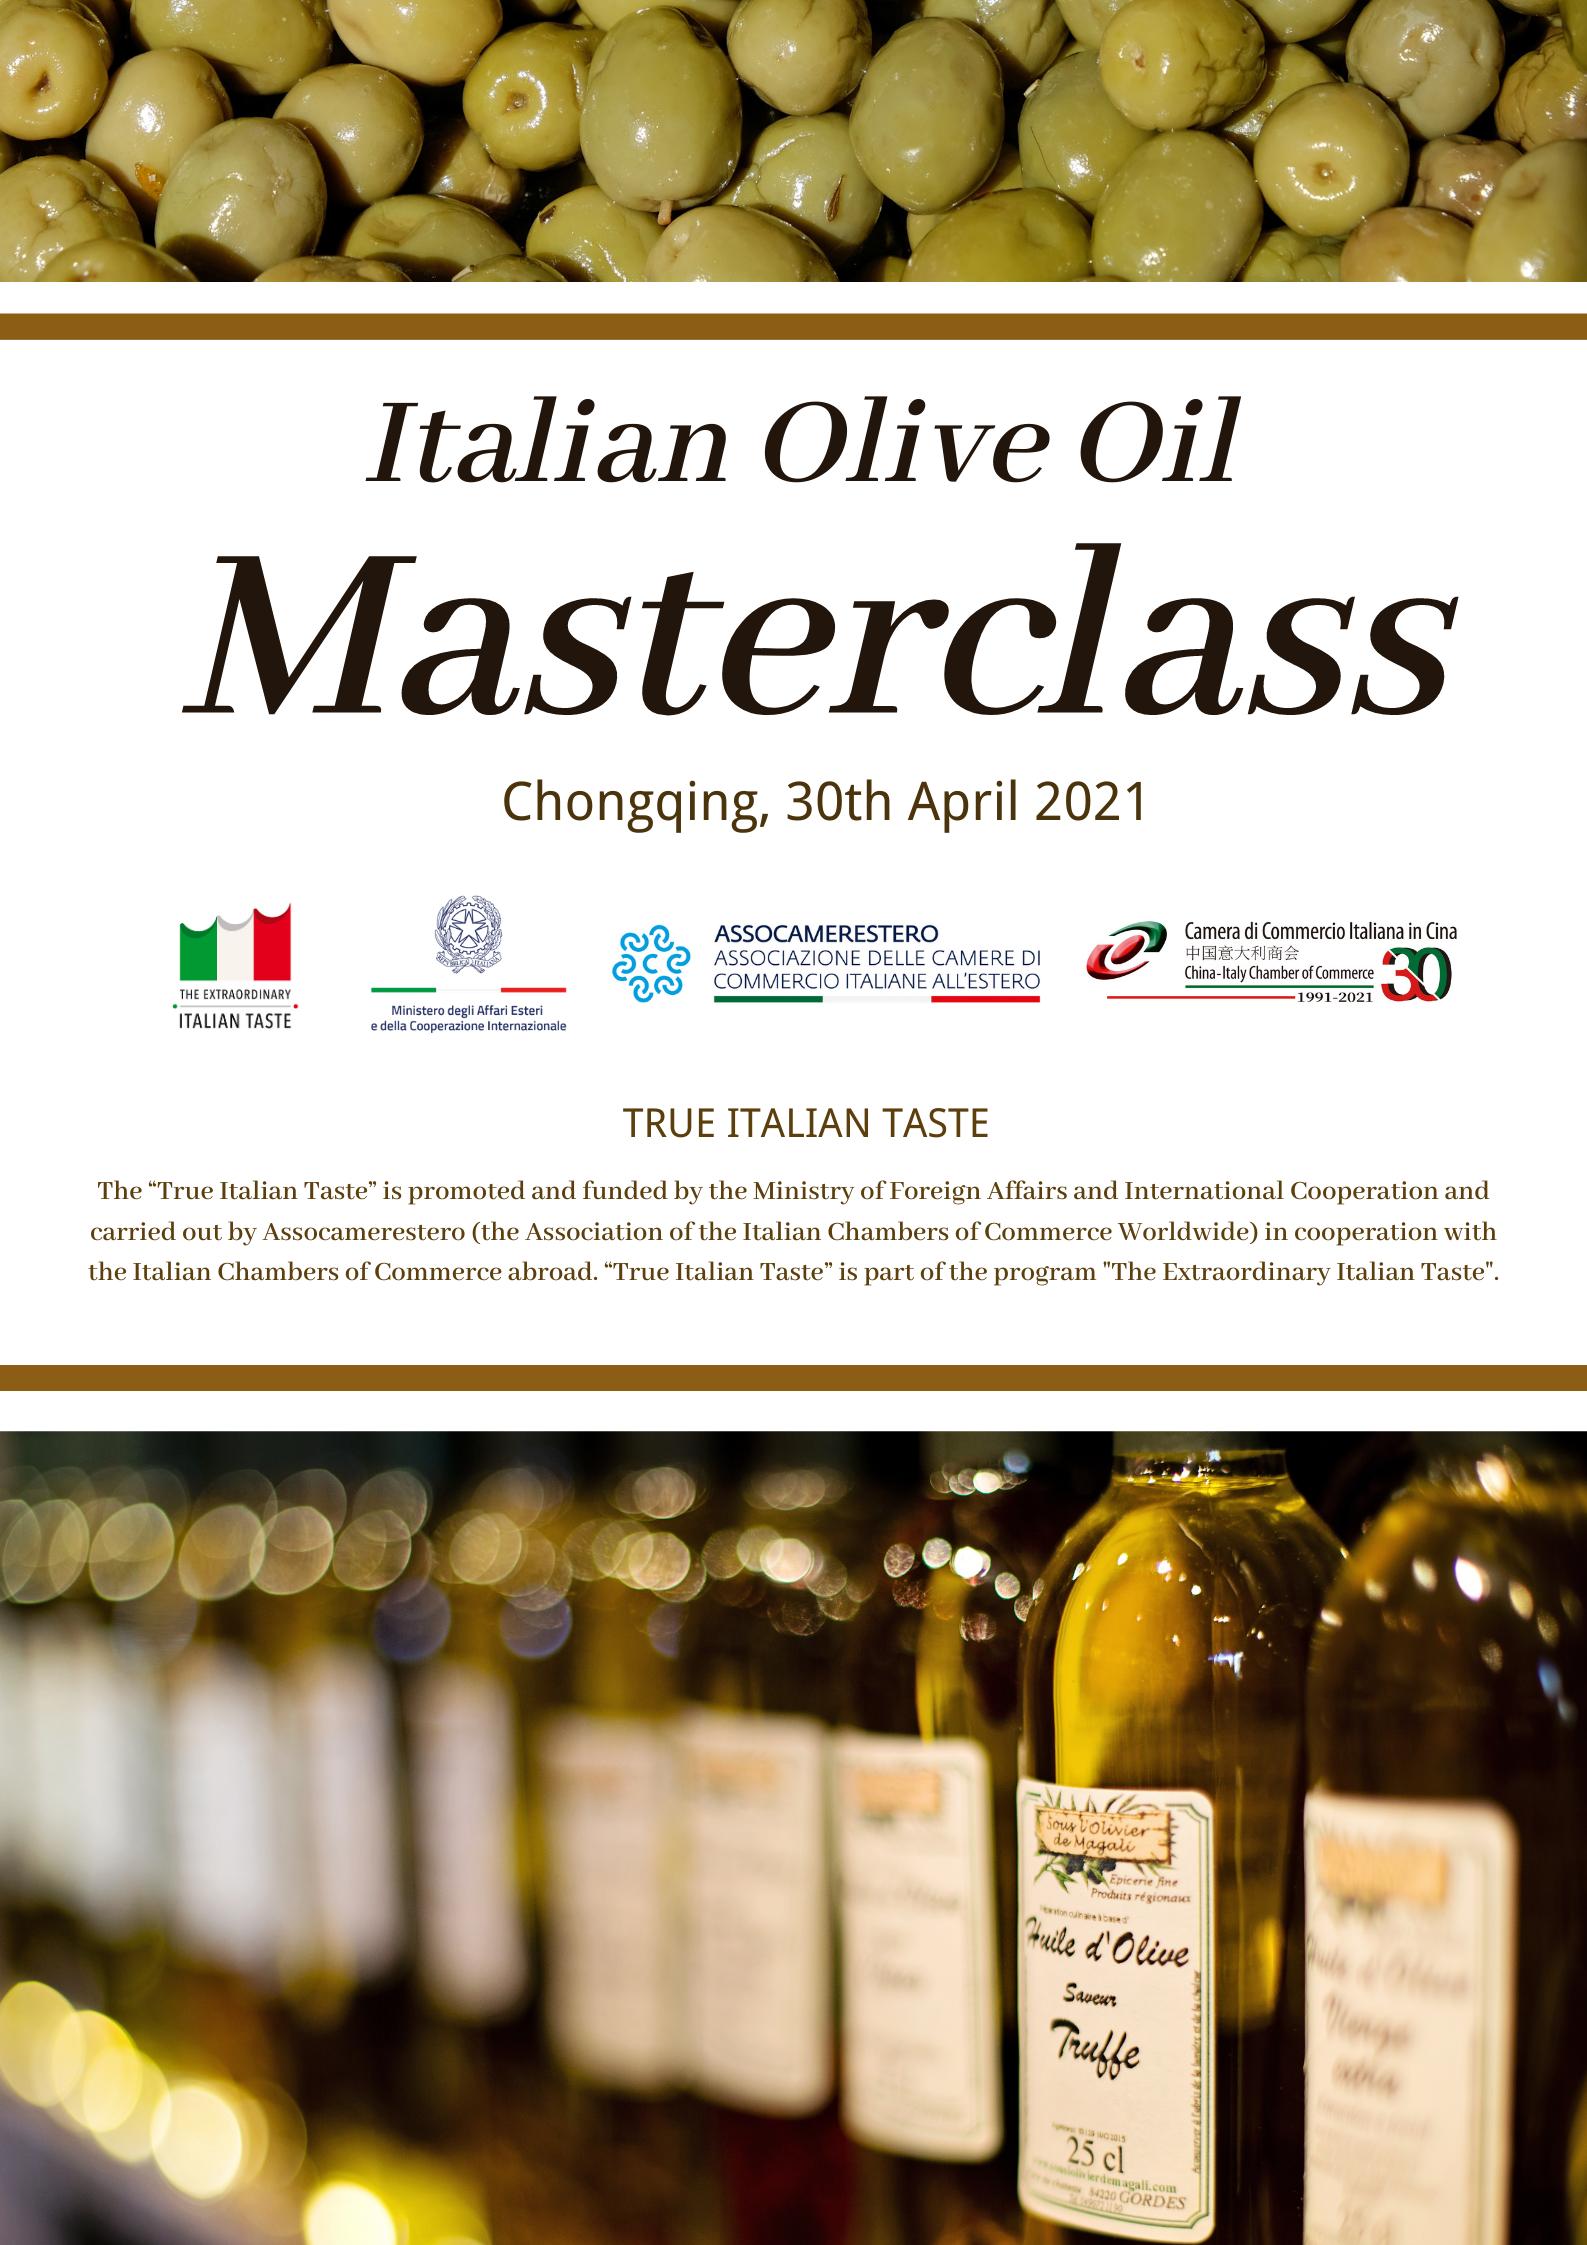 Masterclass - Italian Olive Oil in Chongqing